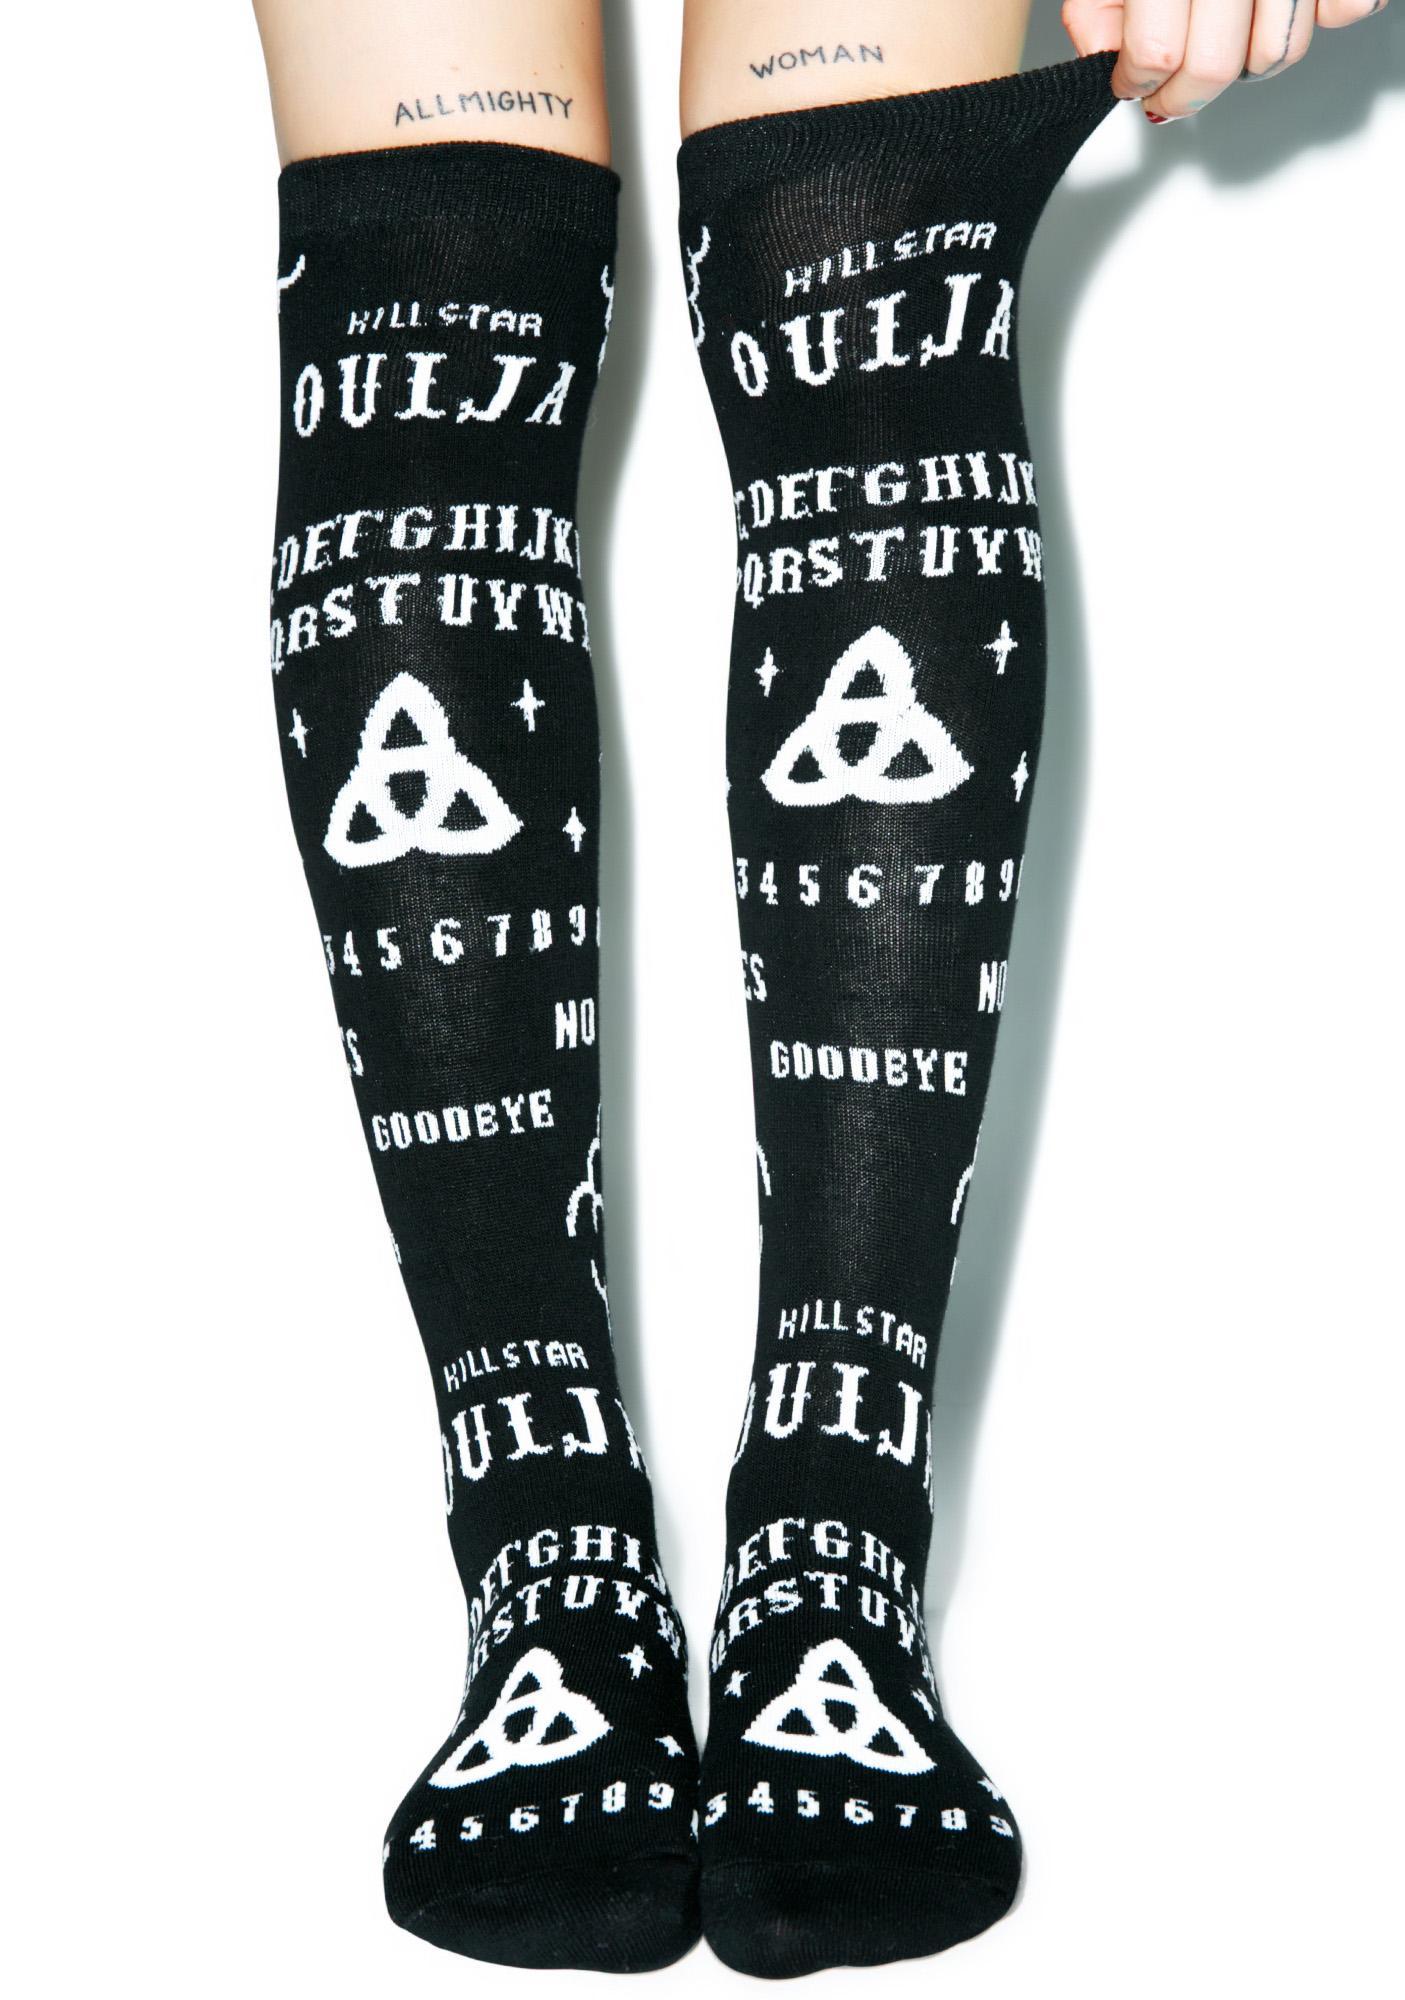 Killstar Ouija Over The Knee Socks